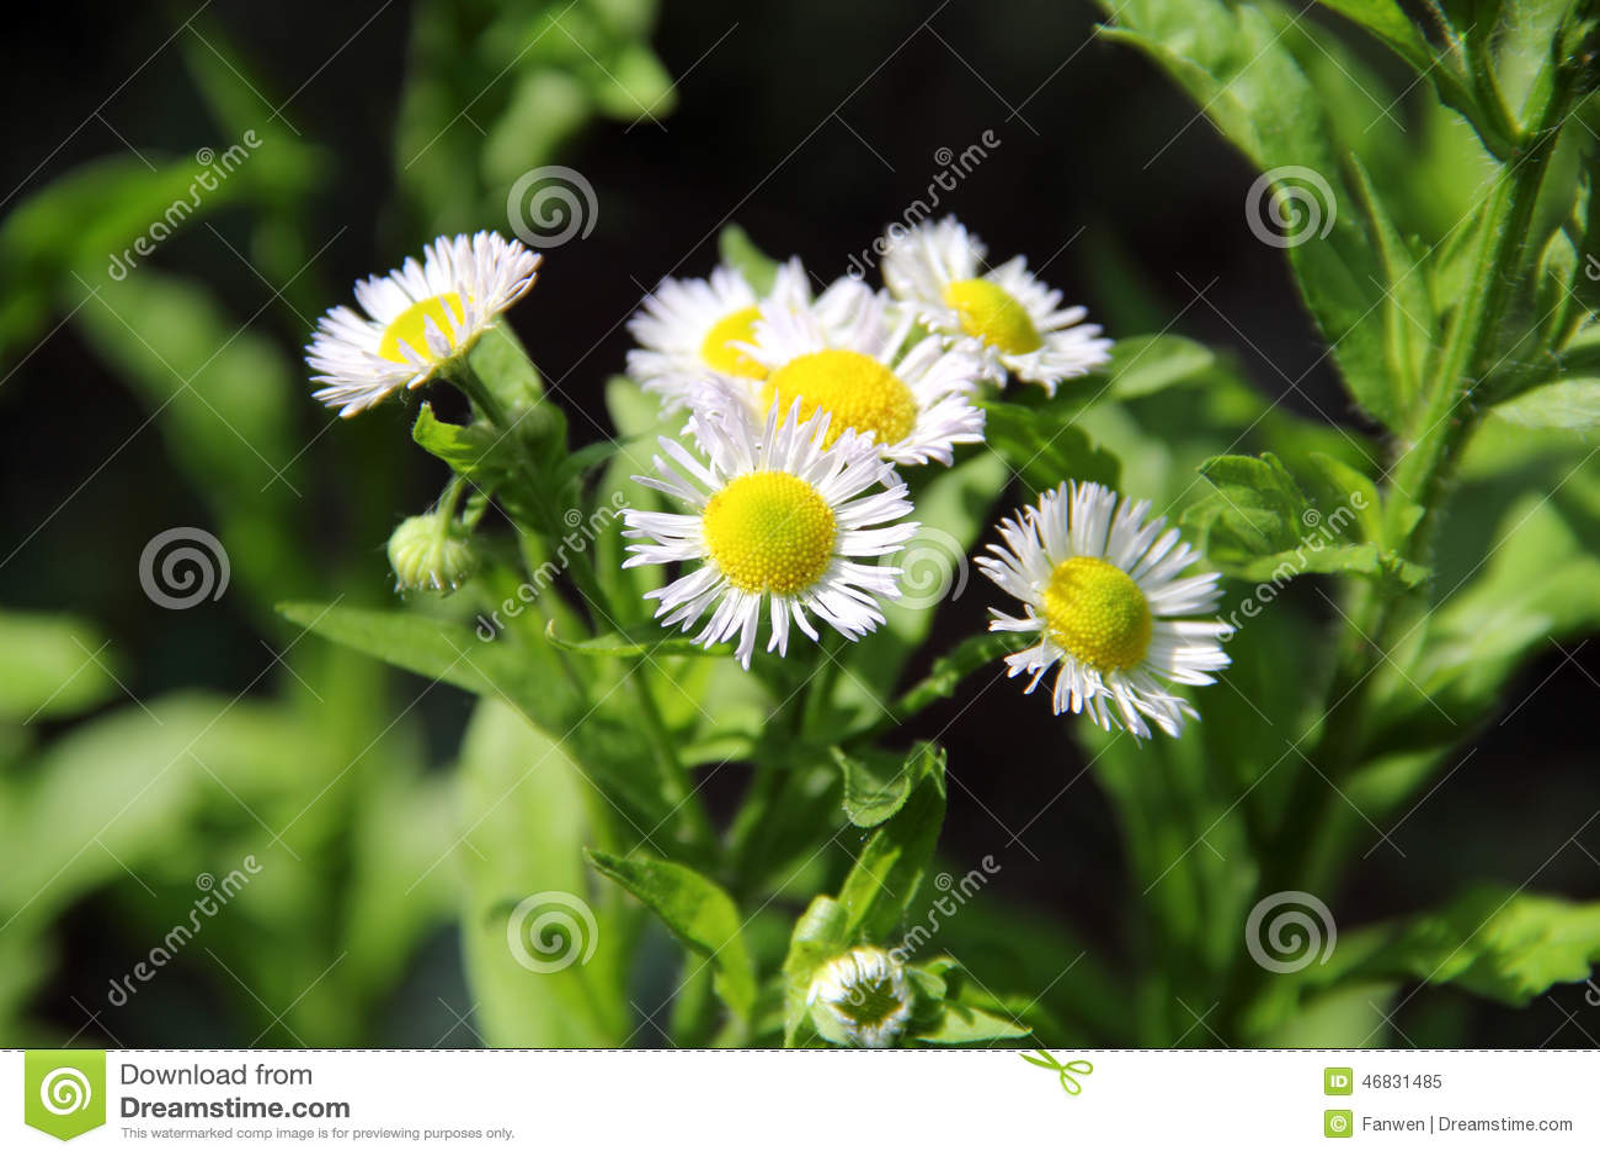 annual fleabane herb stock photo